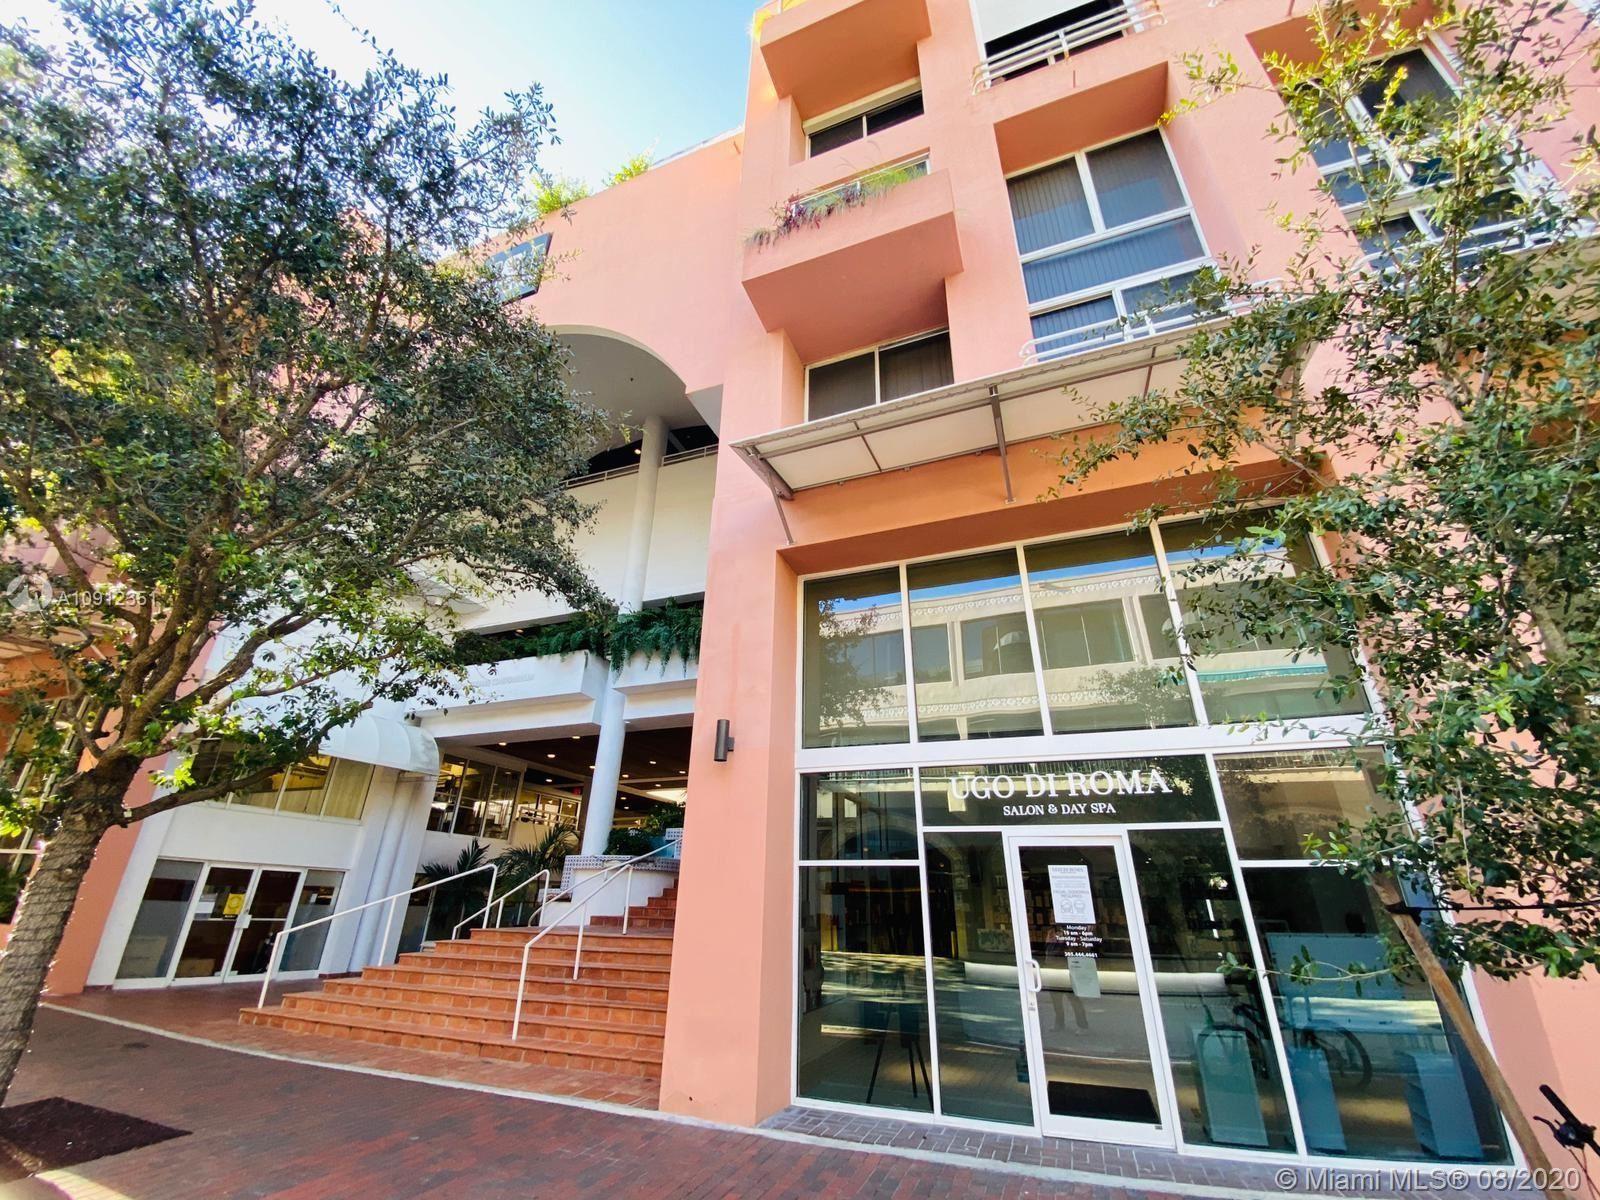 2801 Florida Ave #236, Miami, FL 33133 - #: A10912351